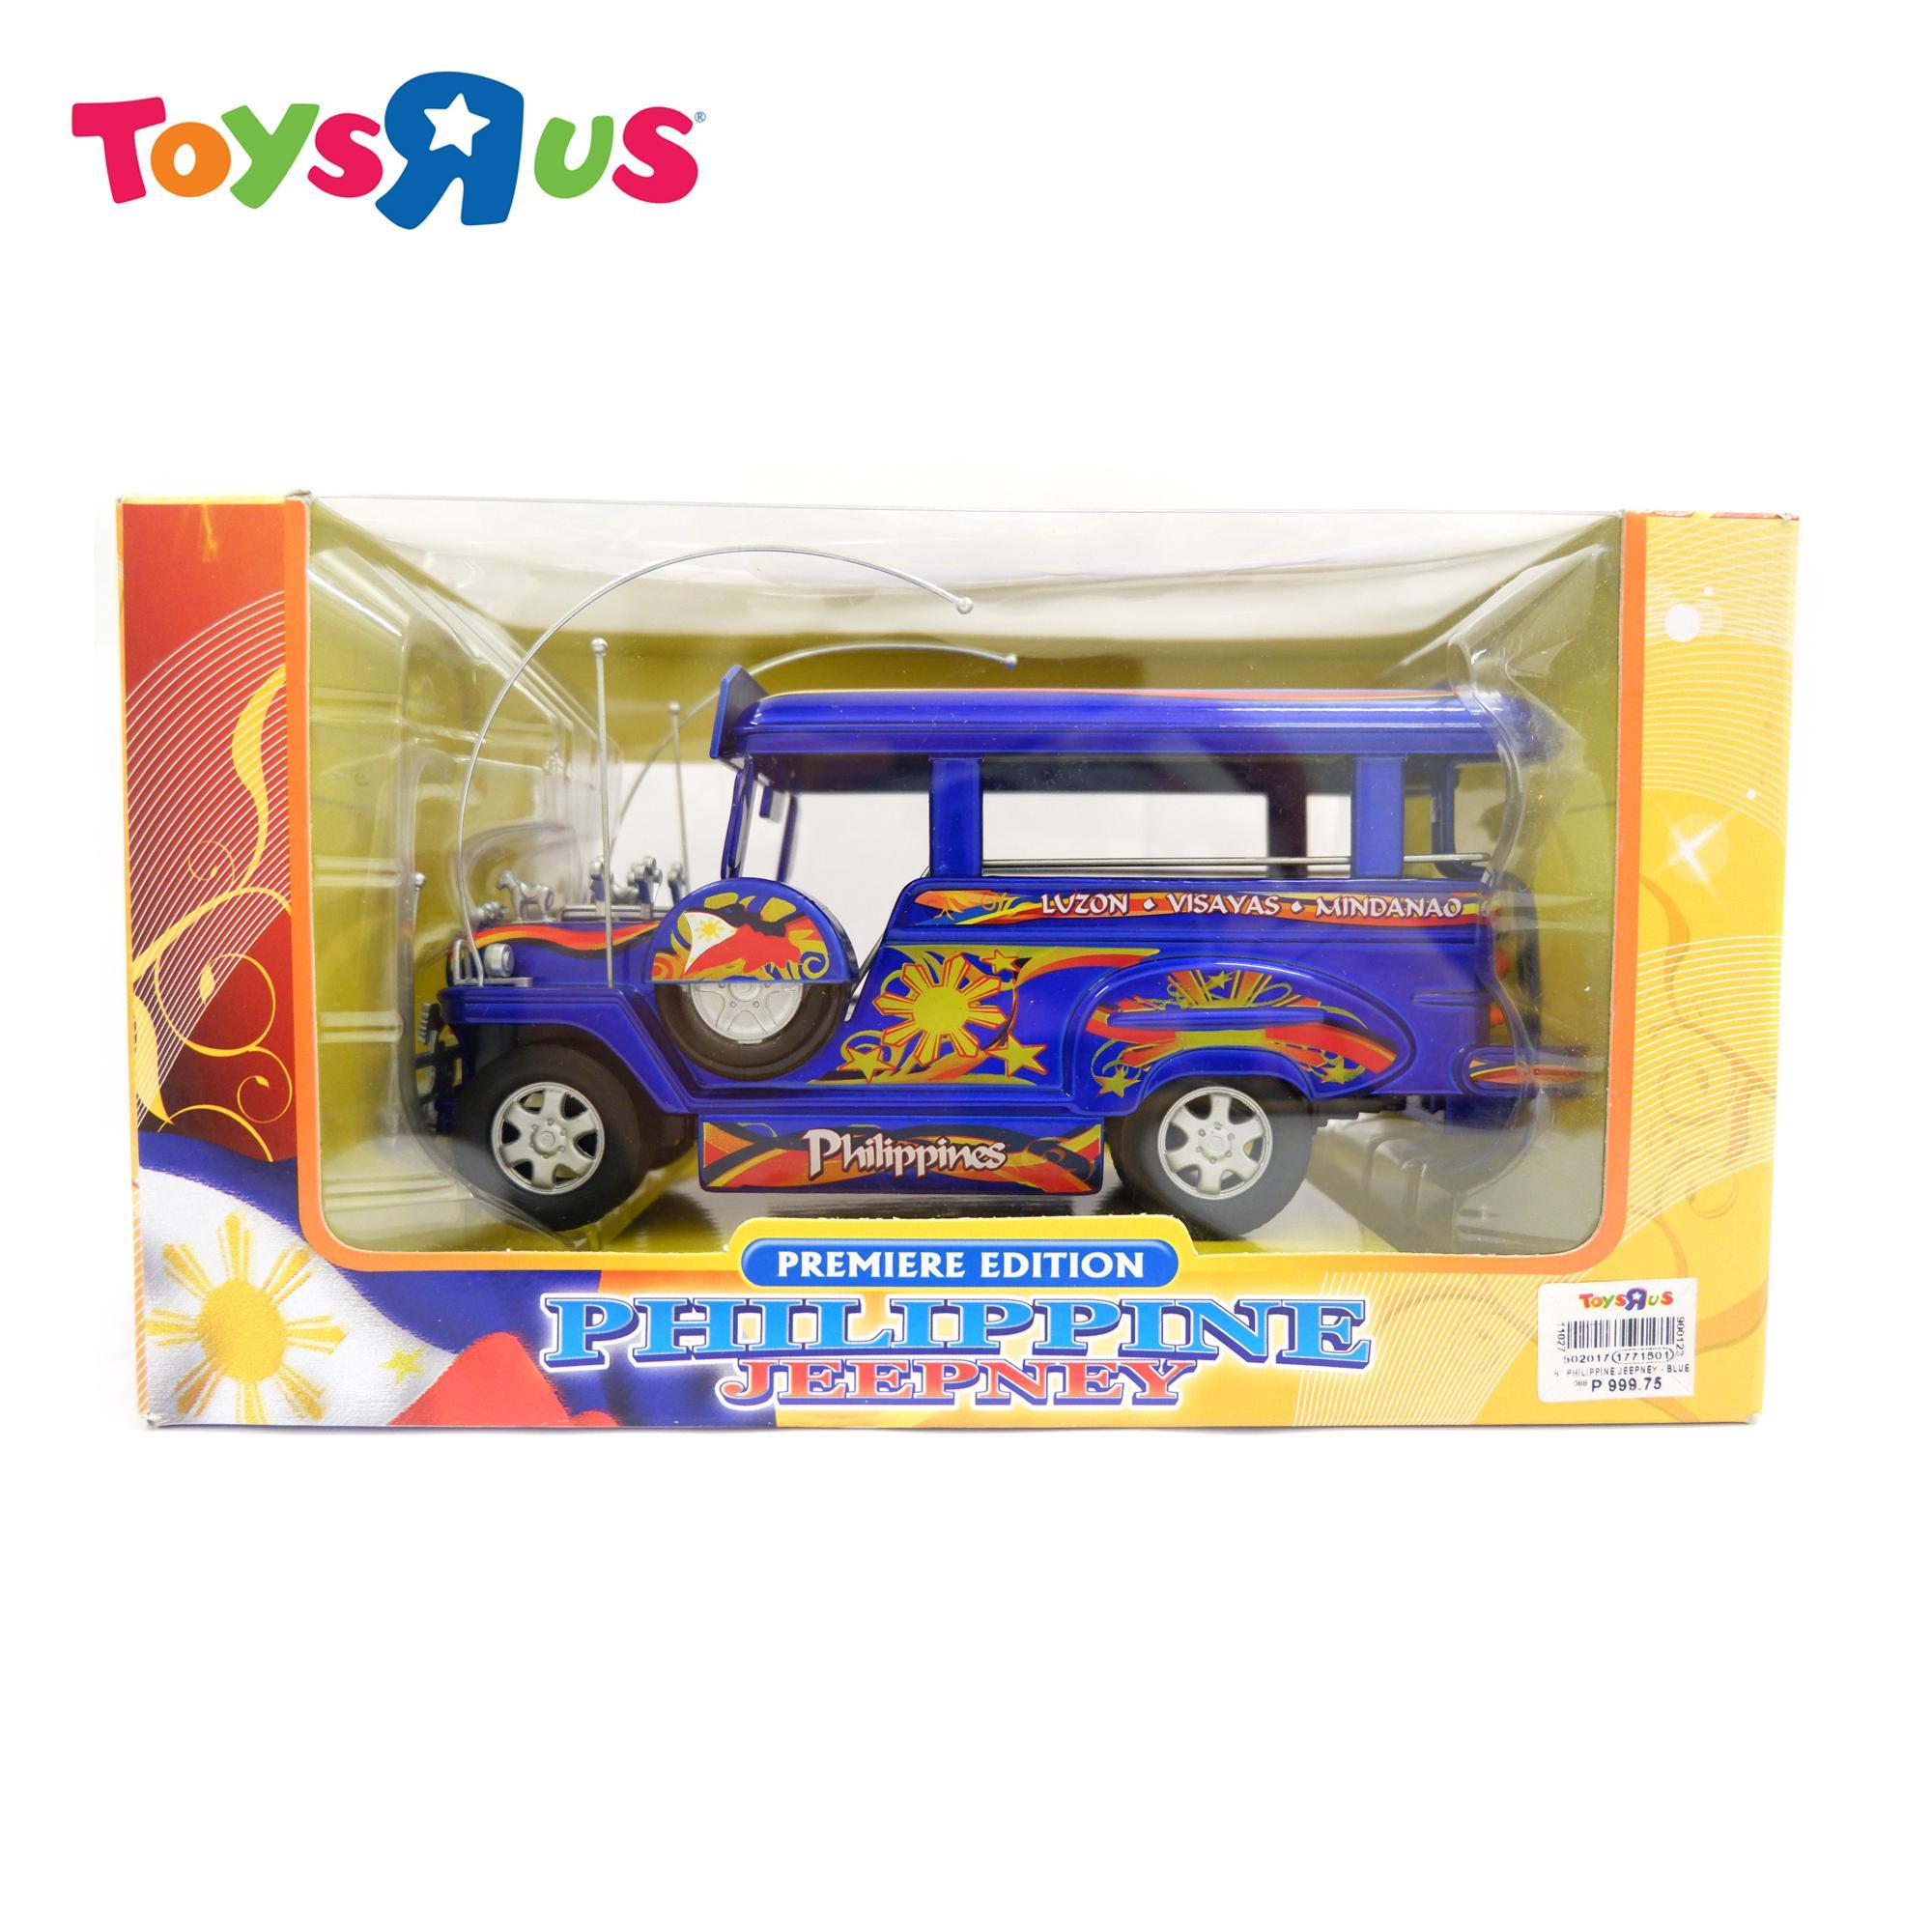 Rc Die Cast For Sale Remote Vehicles Online Brands Initial D Skyline Gt Rr32 No 141 Dream Tomica Phillipine Jeepney Blue